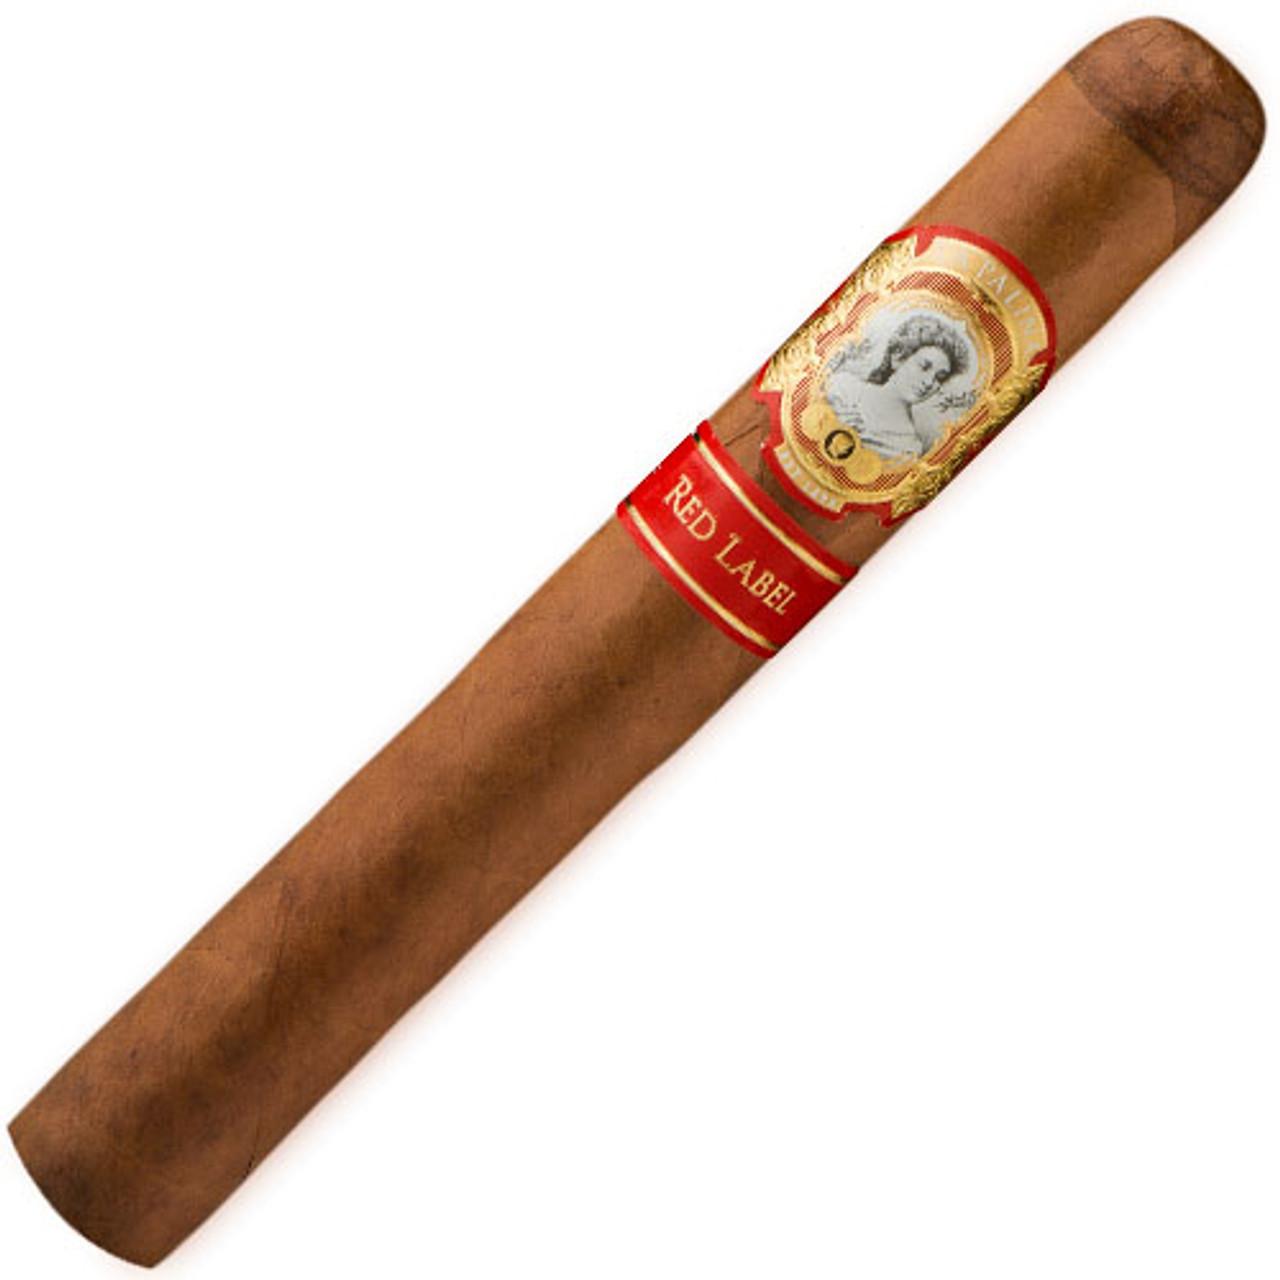 La Palina Red Label Toro Cigars - 6 x 50 (Box of 20)